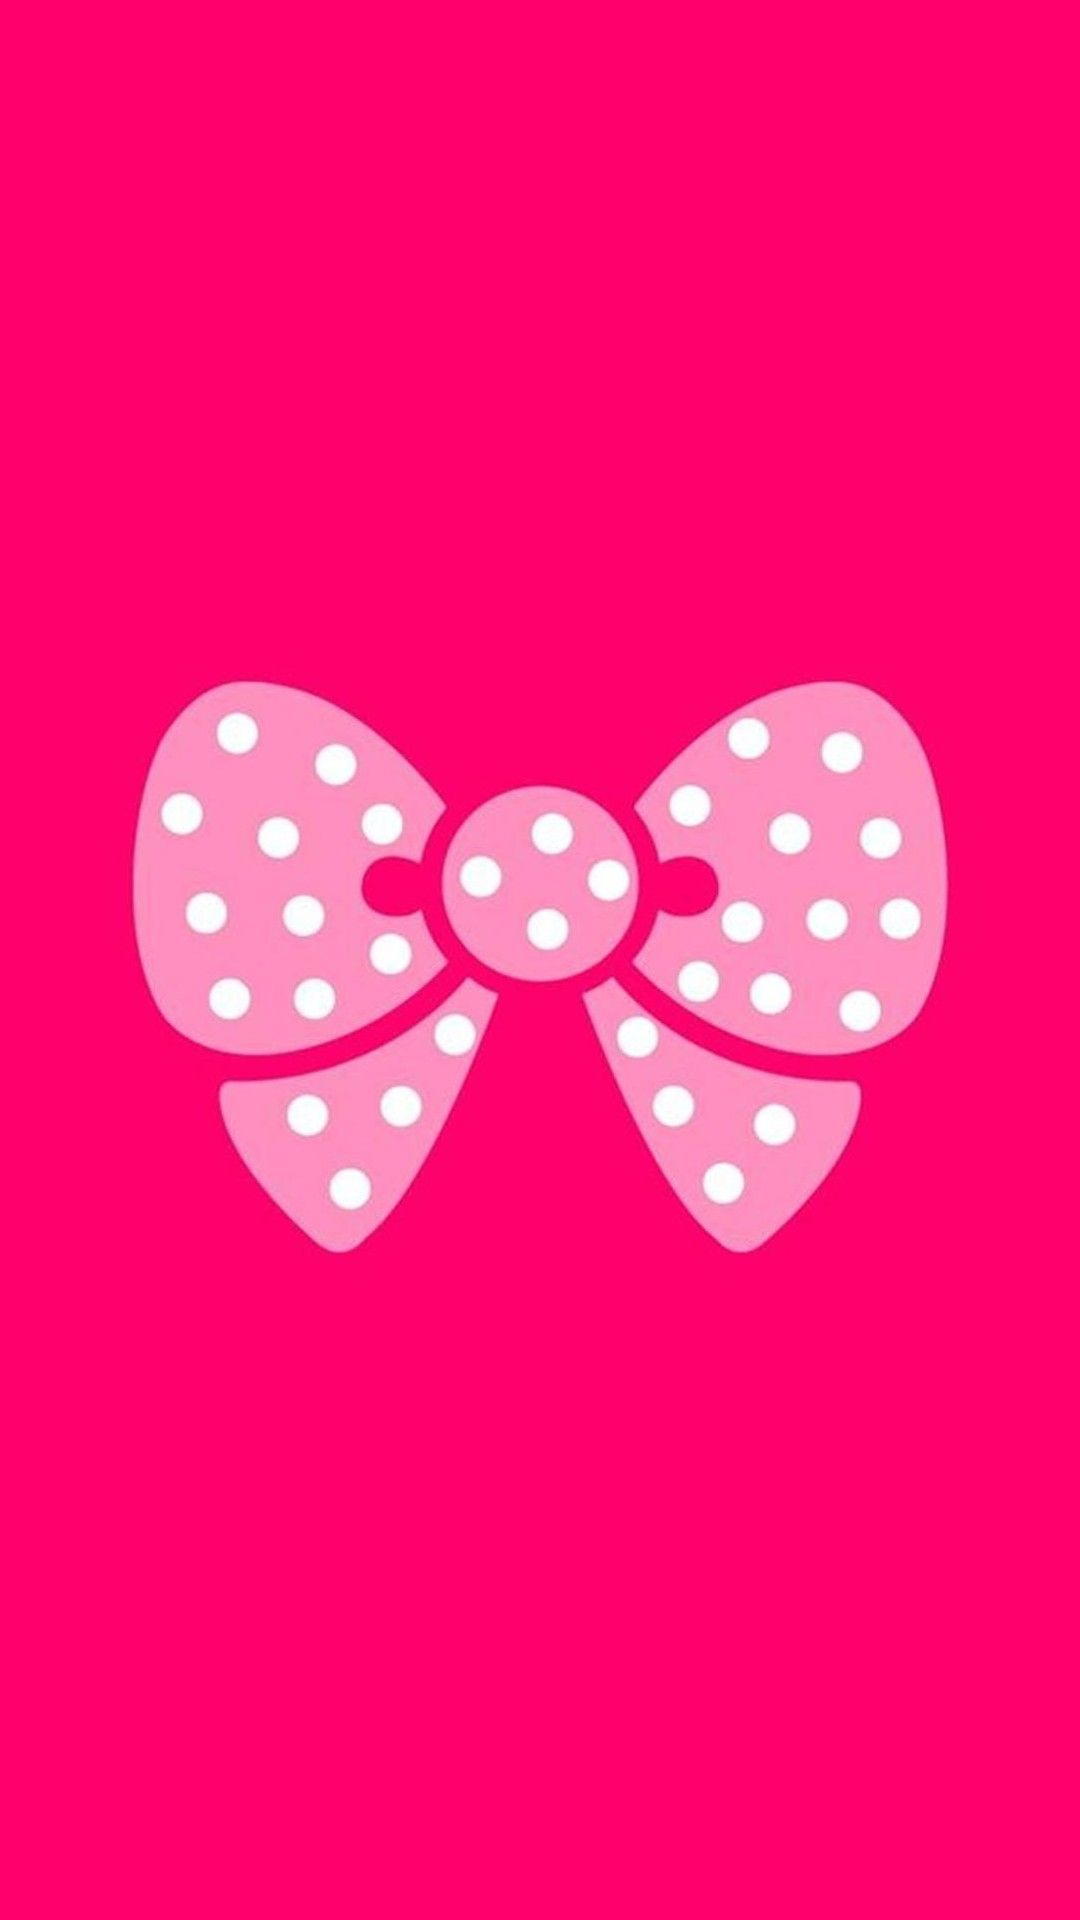 Simple Wallpaper Hello Kitty Ribbon - a4cf20d80dd3d39e1c7dc6b1a35e6400  You Should Have_525029.jpg